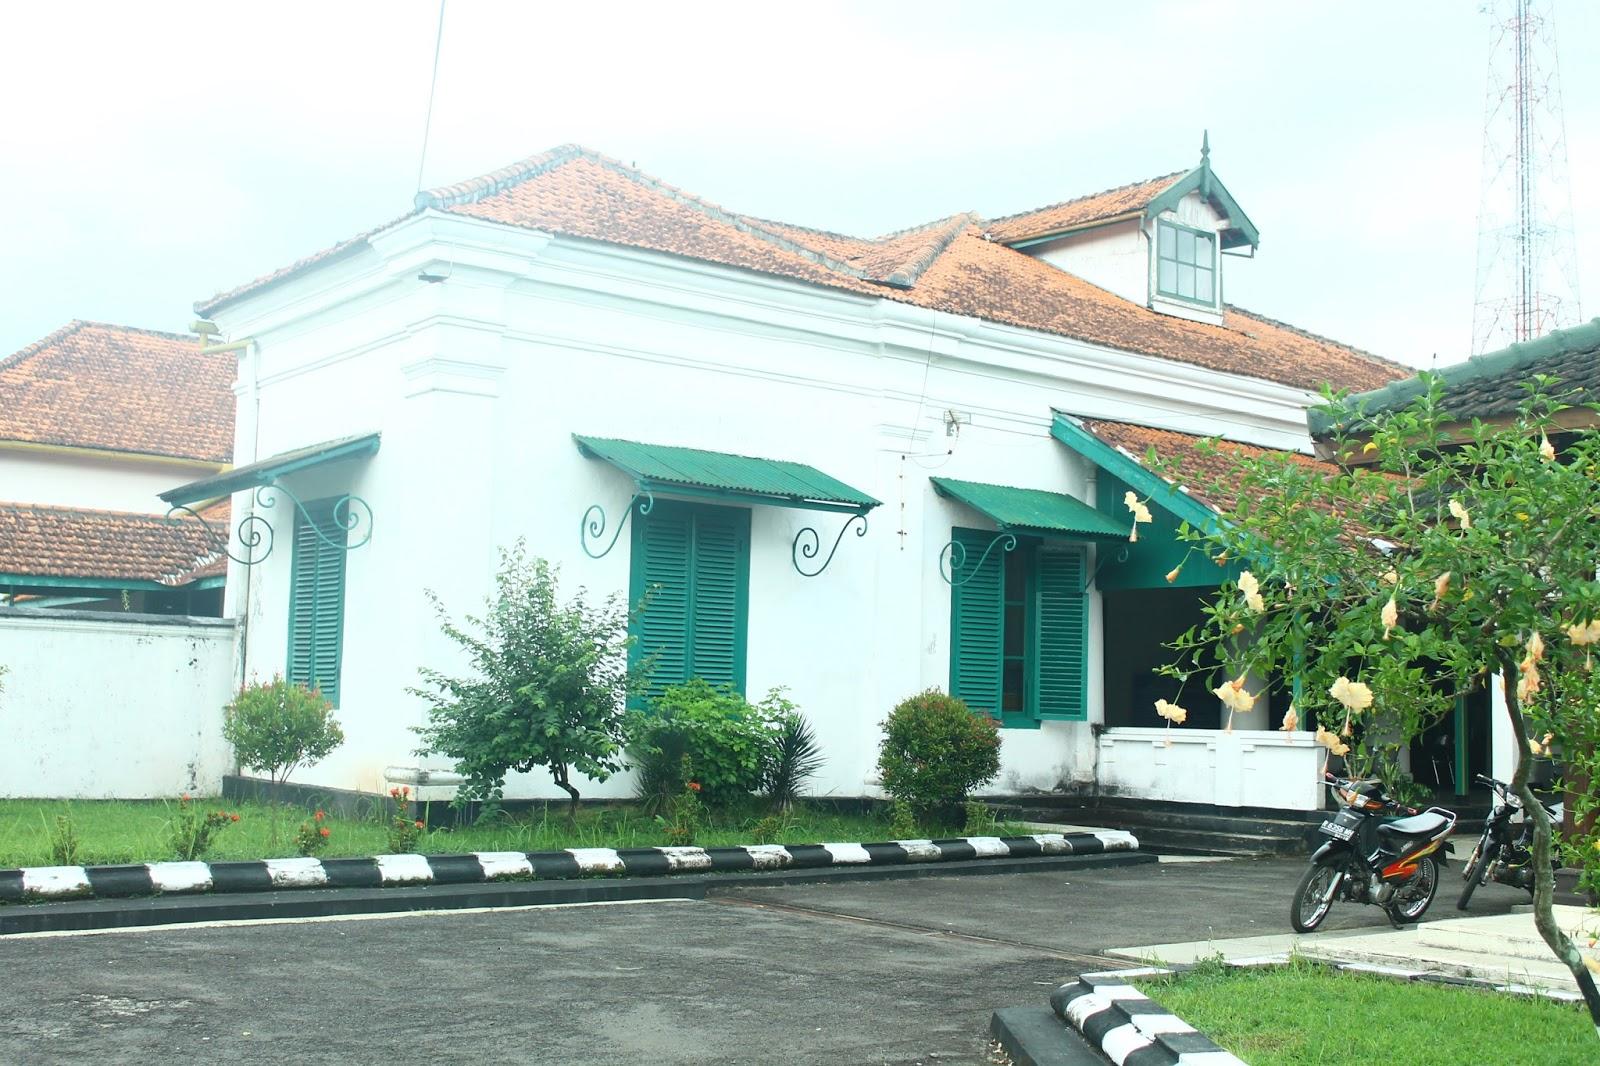 Tourismbomaobject Museum Wayang Banyumas Group 3 Sendhang Mas Kab